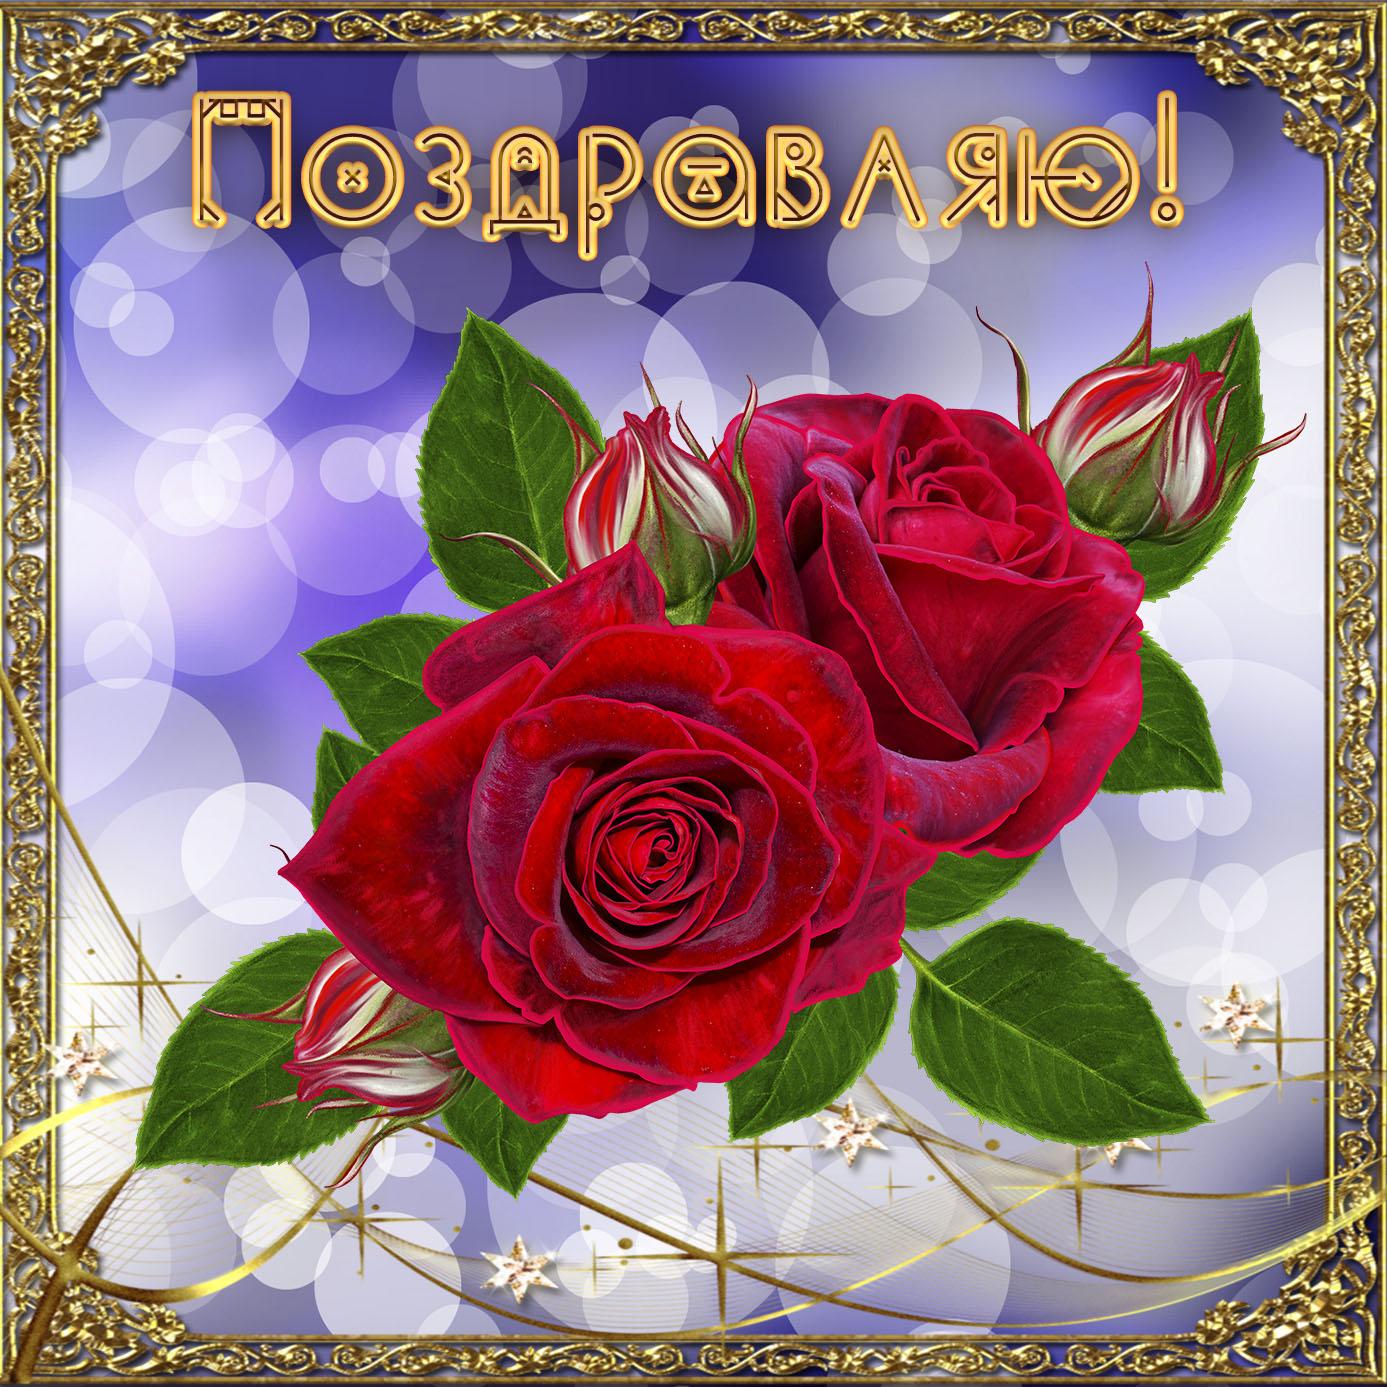 Картинка с красивыми розами на приятном фоне